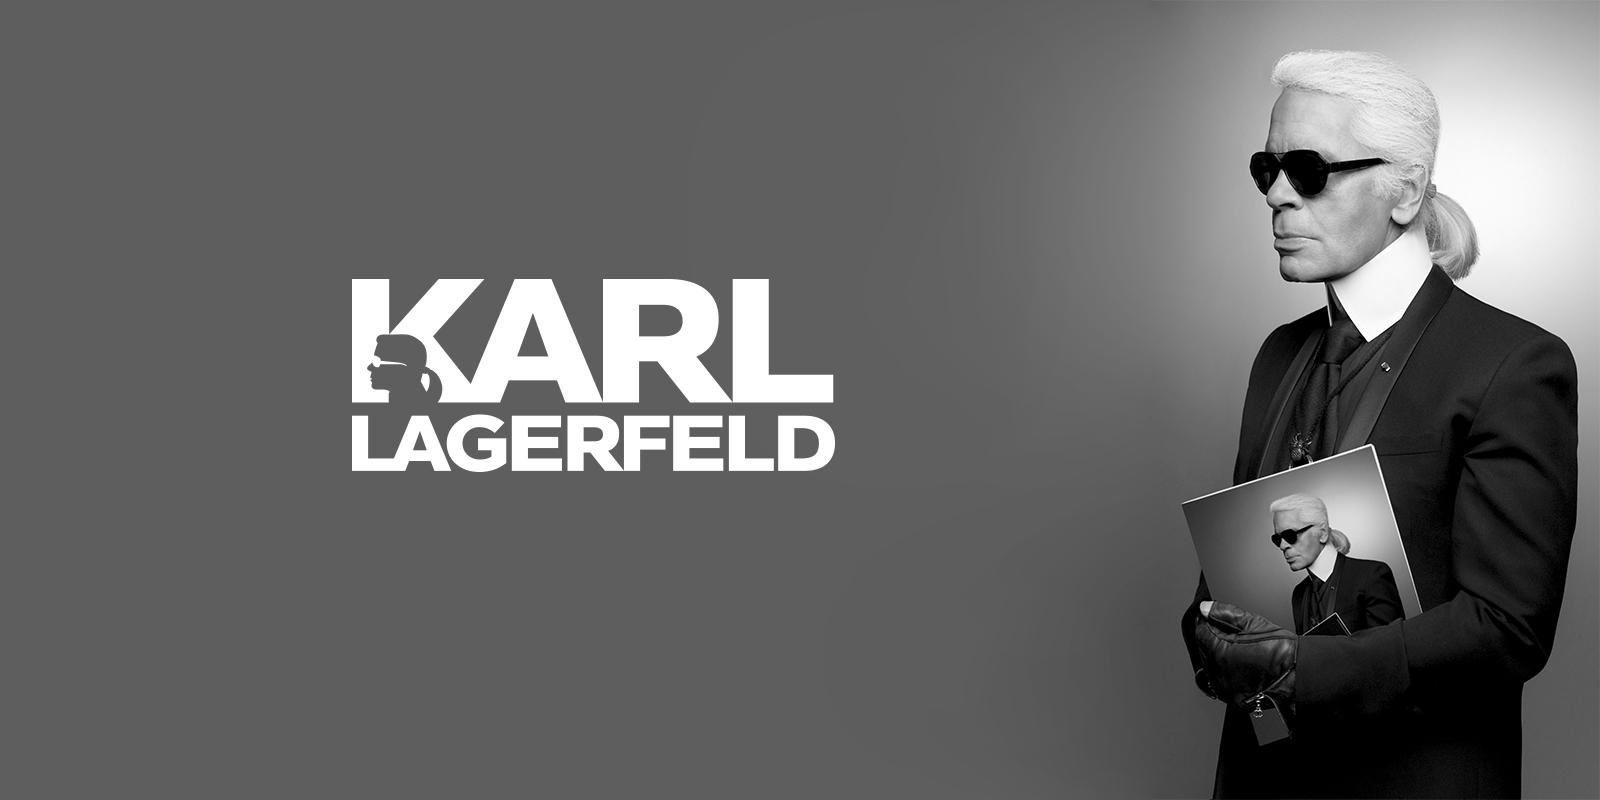 karl lagerfeld man women watch kl2205 217 65 montre uhren reloj ebay. Black Bedroom Furniture Sets. Home Design Ideas